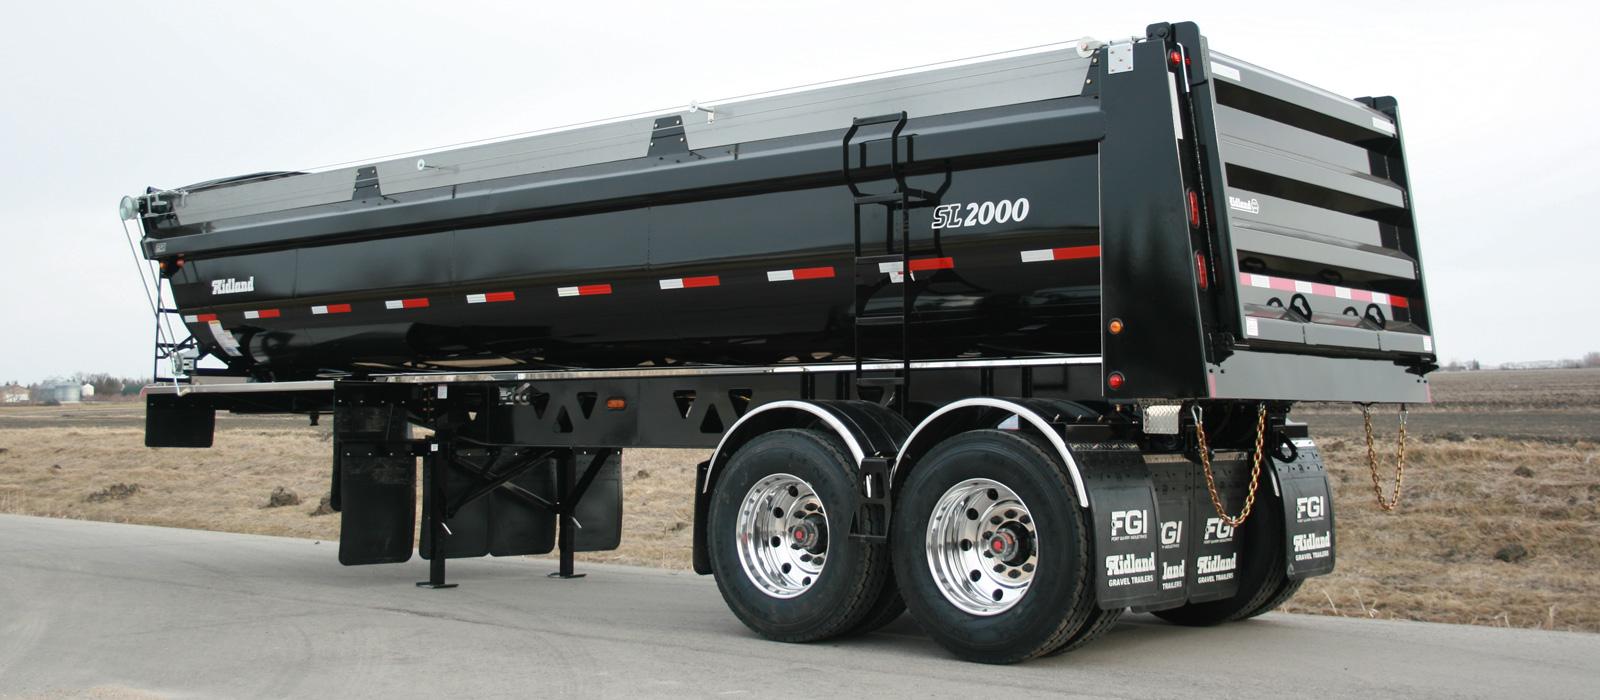 SL 2000 trailer